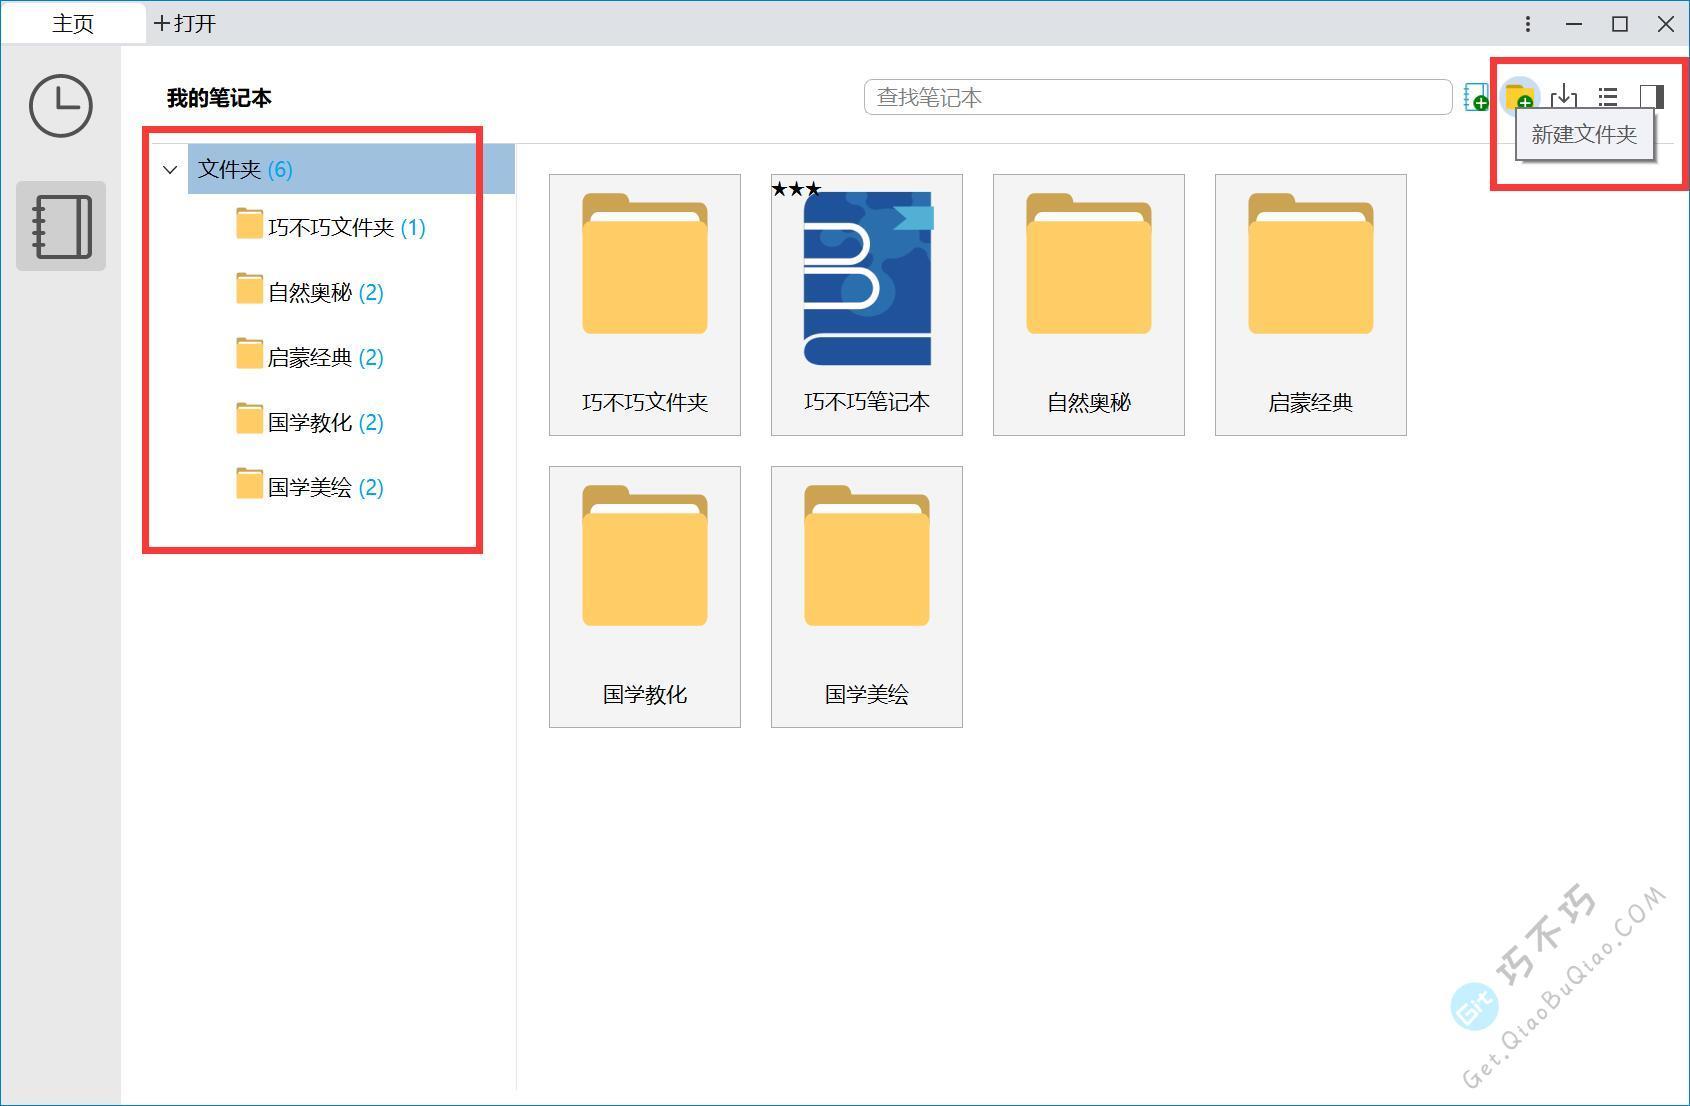 Windows端笔记、注释、批注独立的PDF、Epub书籍管理阅读器,可配置第三方同步笔记和进度